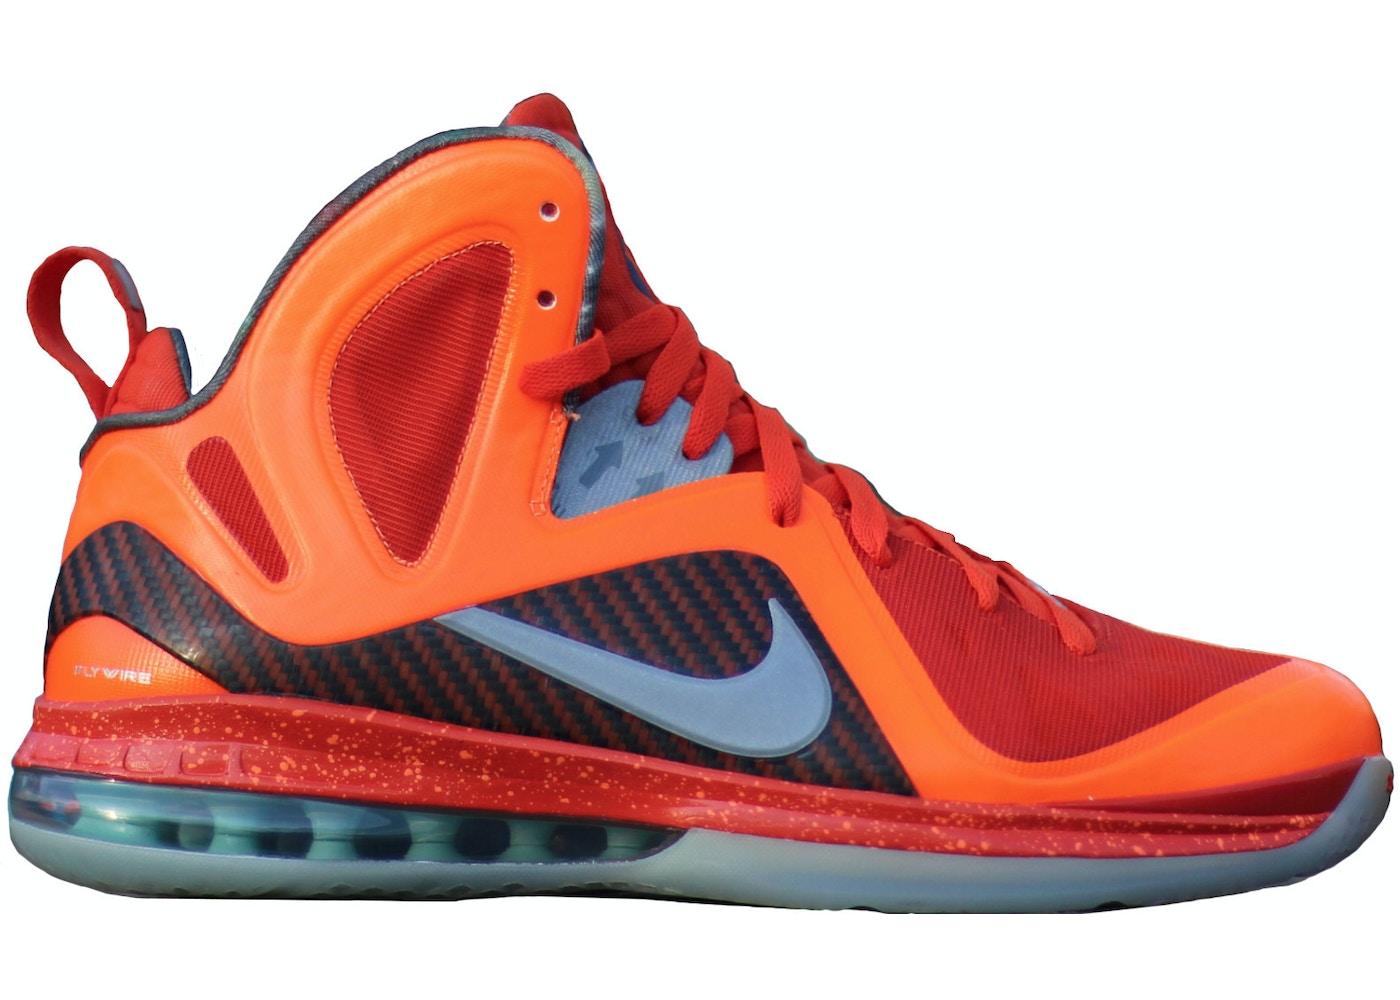 detailing 6b115 4f2ed Nike LeBron Shoes - Highest Bid